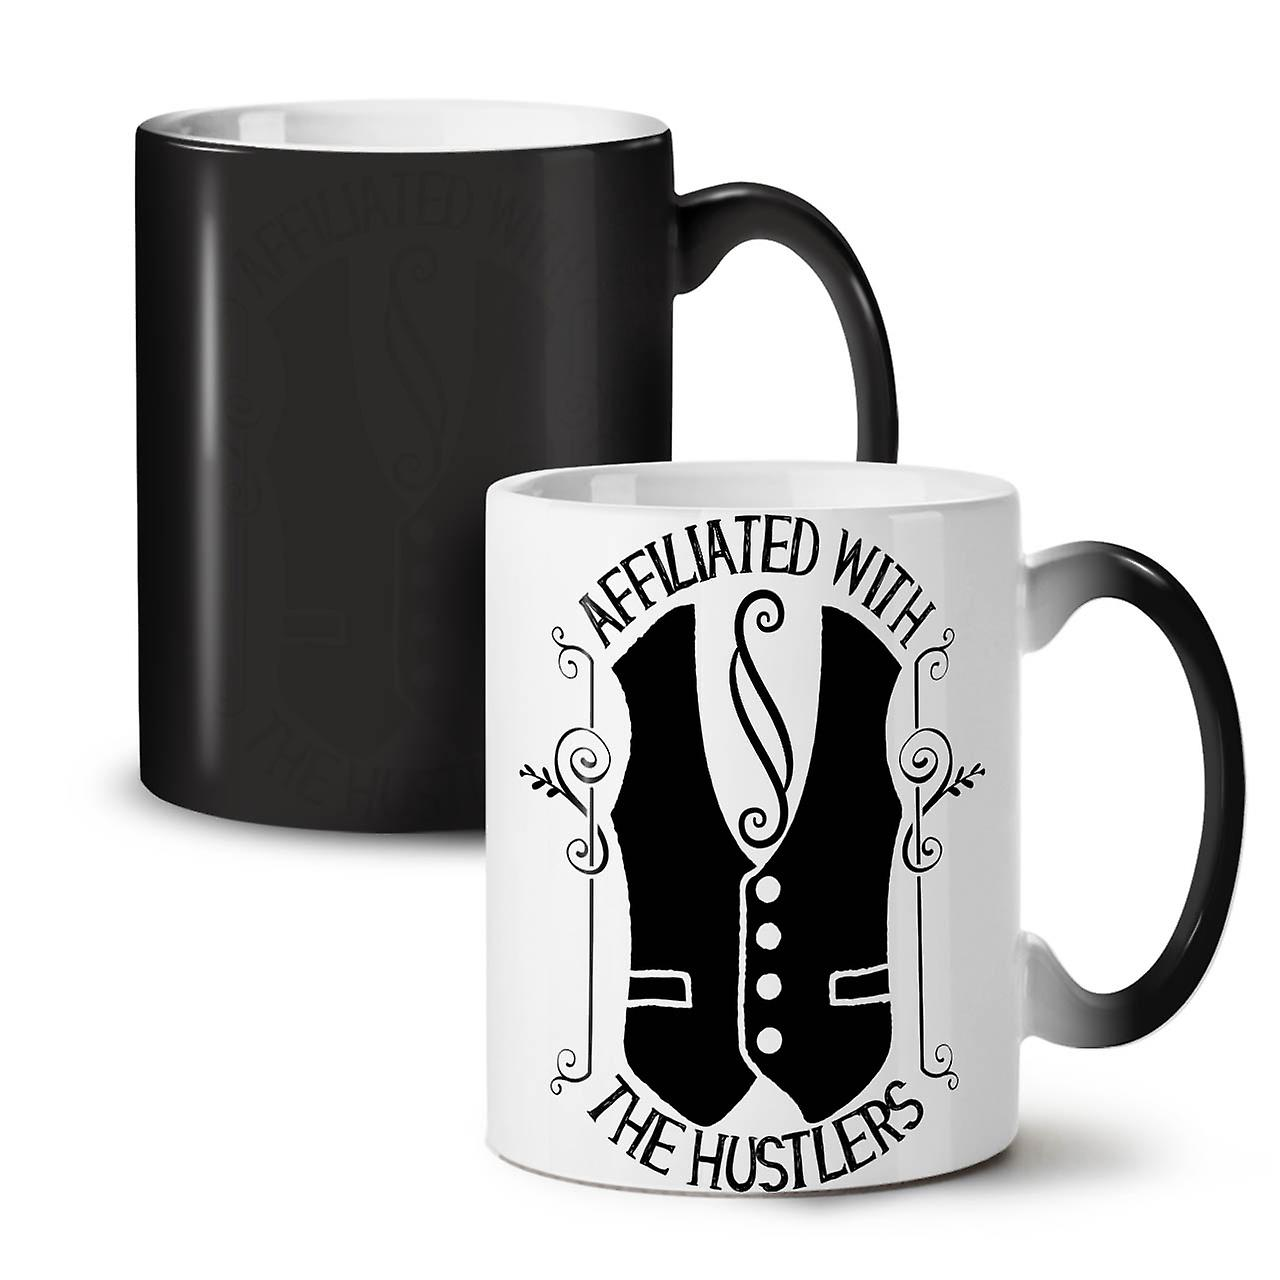 OzWellcoda Gangster Changing Gamers Cool Colour Black Coffee 11 Tea Mug New Ceramic EIWHD29